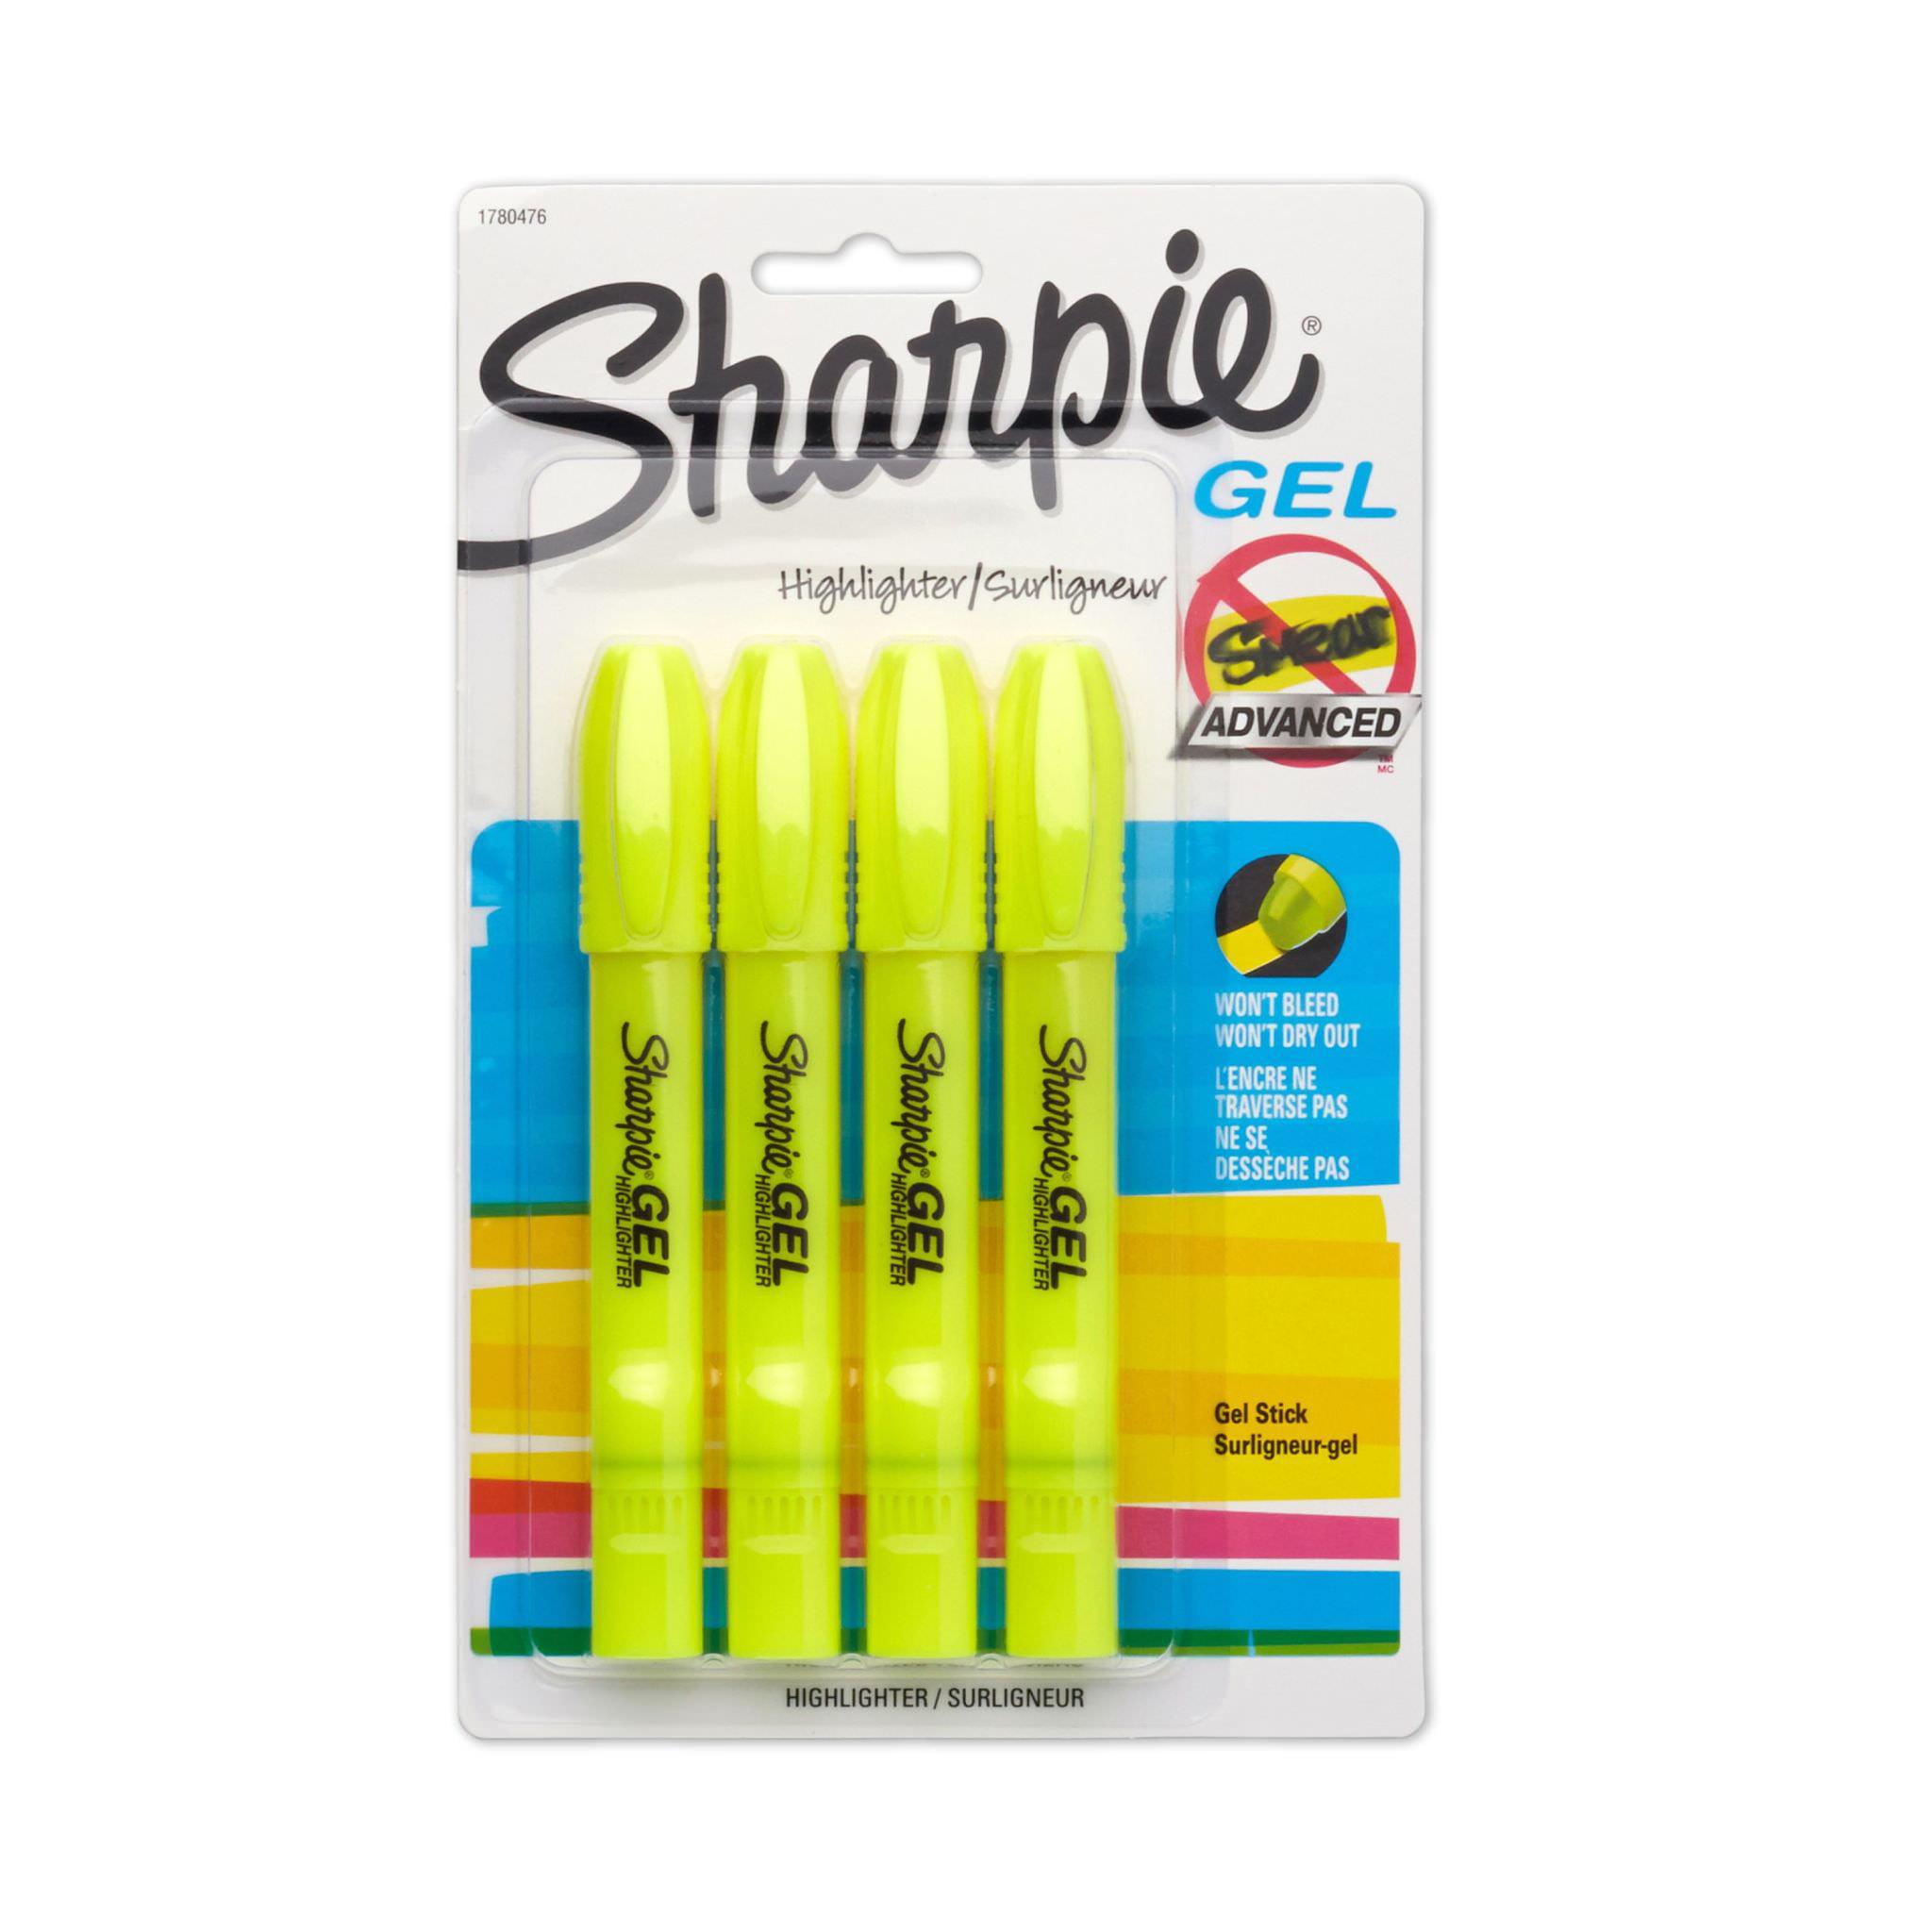 Sharpie Gel Highlighter, Bullet Tip,Yellow, 4-Pack